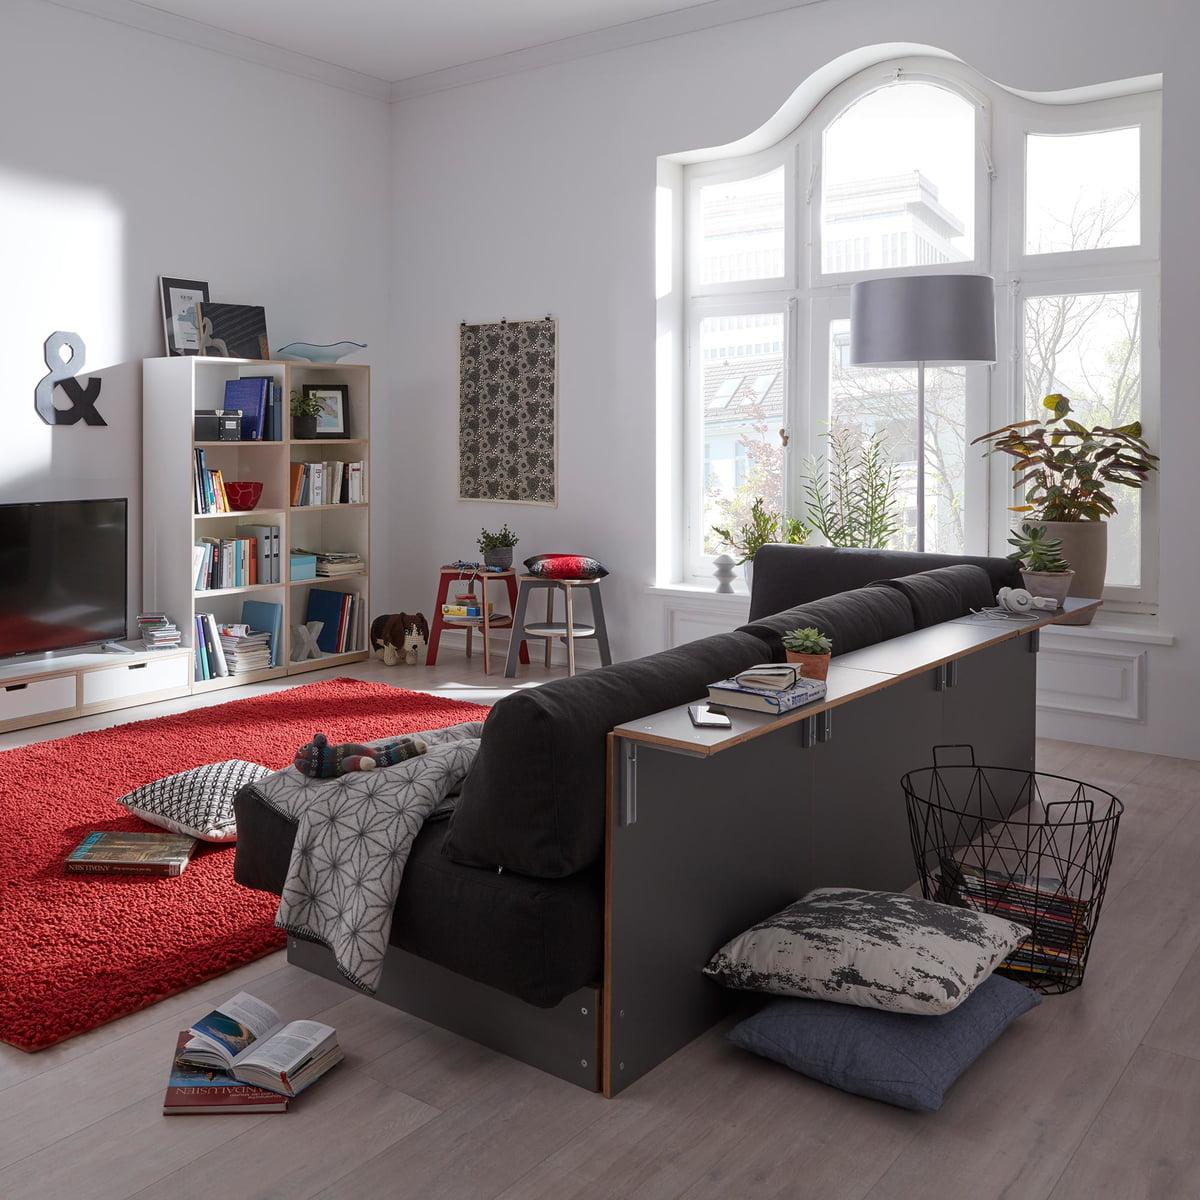 sofabank elemente von m ller m belwerkst tten. Black Bedroom Furniture Sets. Home Design Ideas